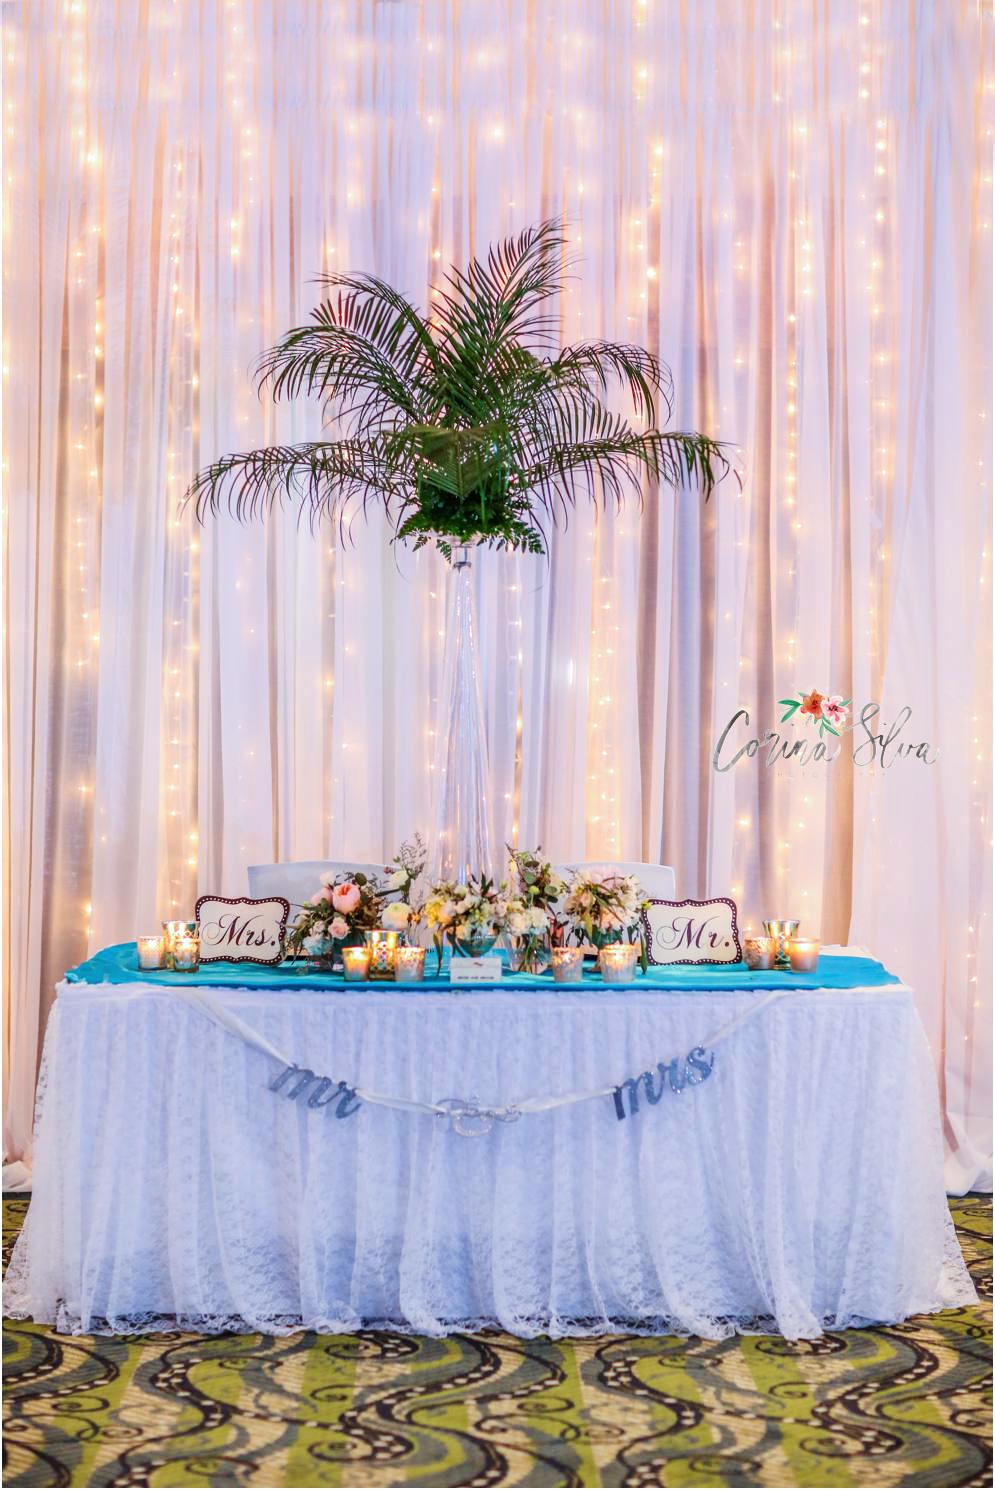 White-blue-hidrangeas-orchids-wedding-decorations, Corina-Silva-Decor-Photography-8.jpg